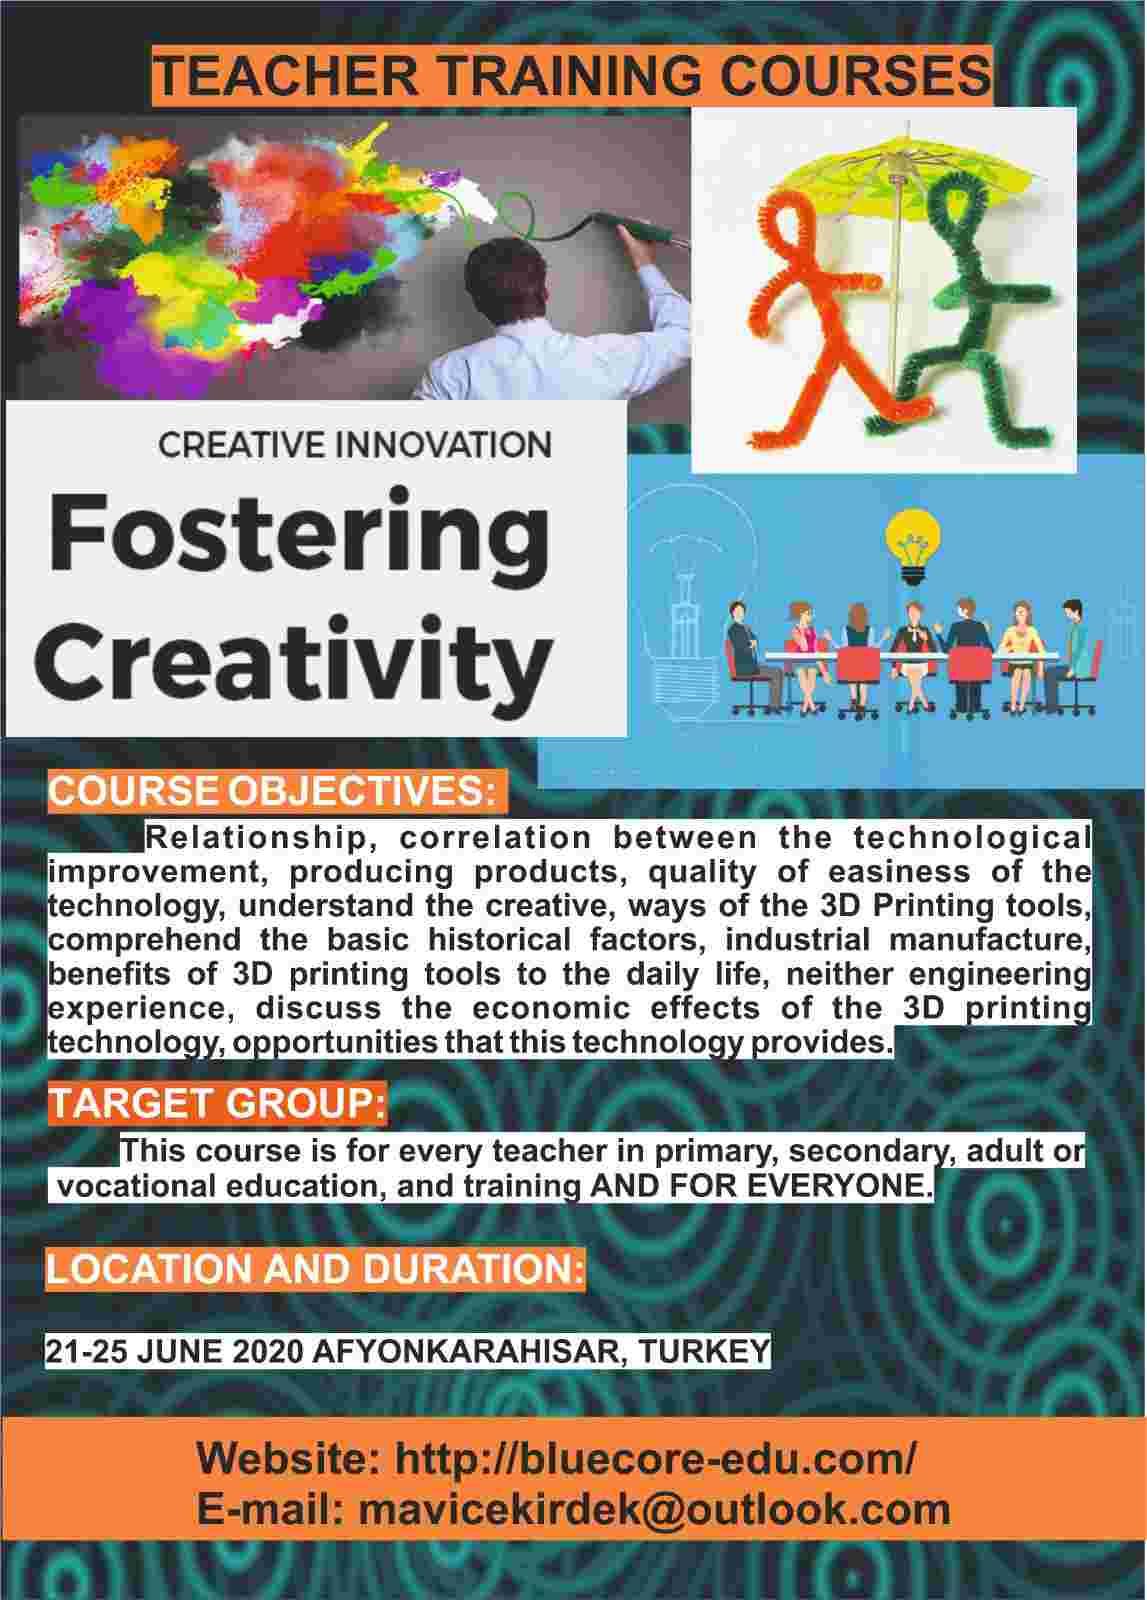 http://bluecore-edu.com/wp-content/uploads/2019/07/FOSTERING-CREATIVITY-3D-PRINTING.pdf